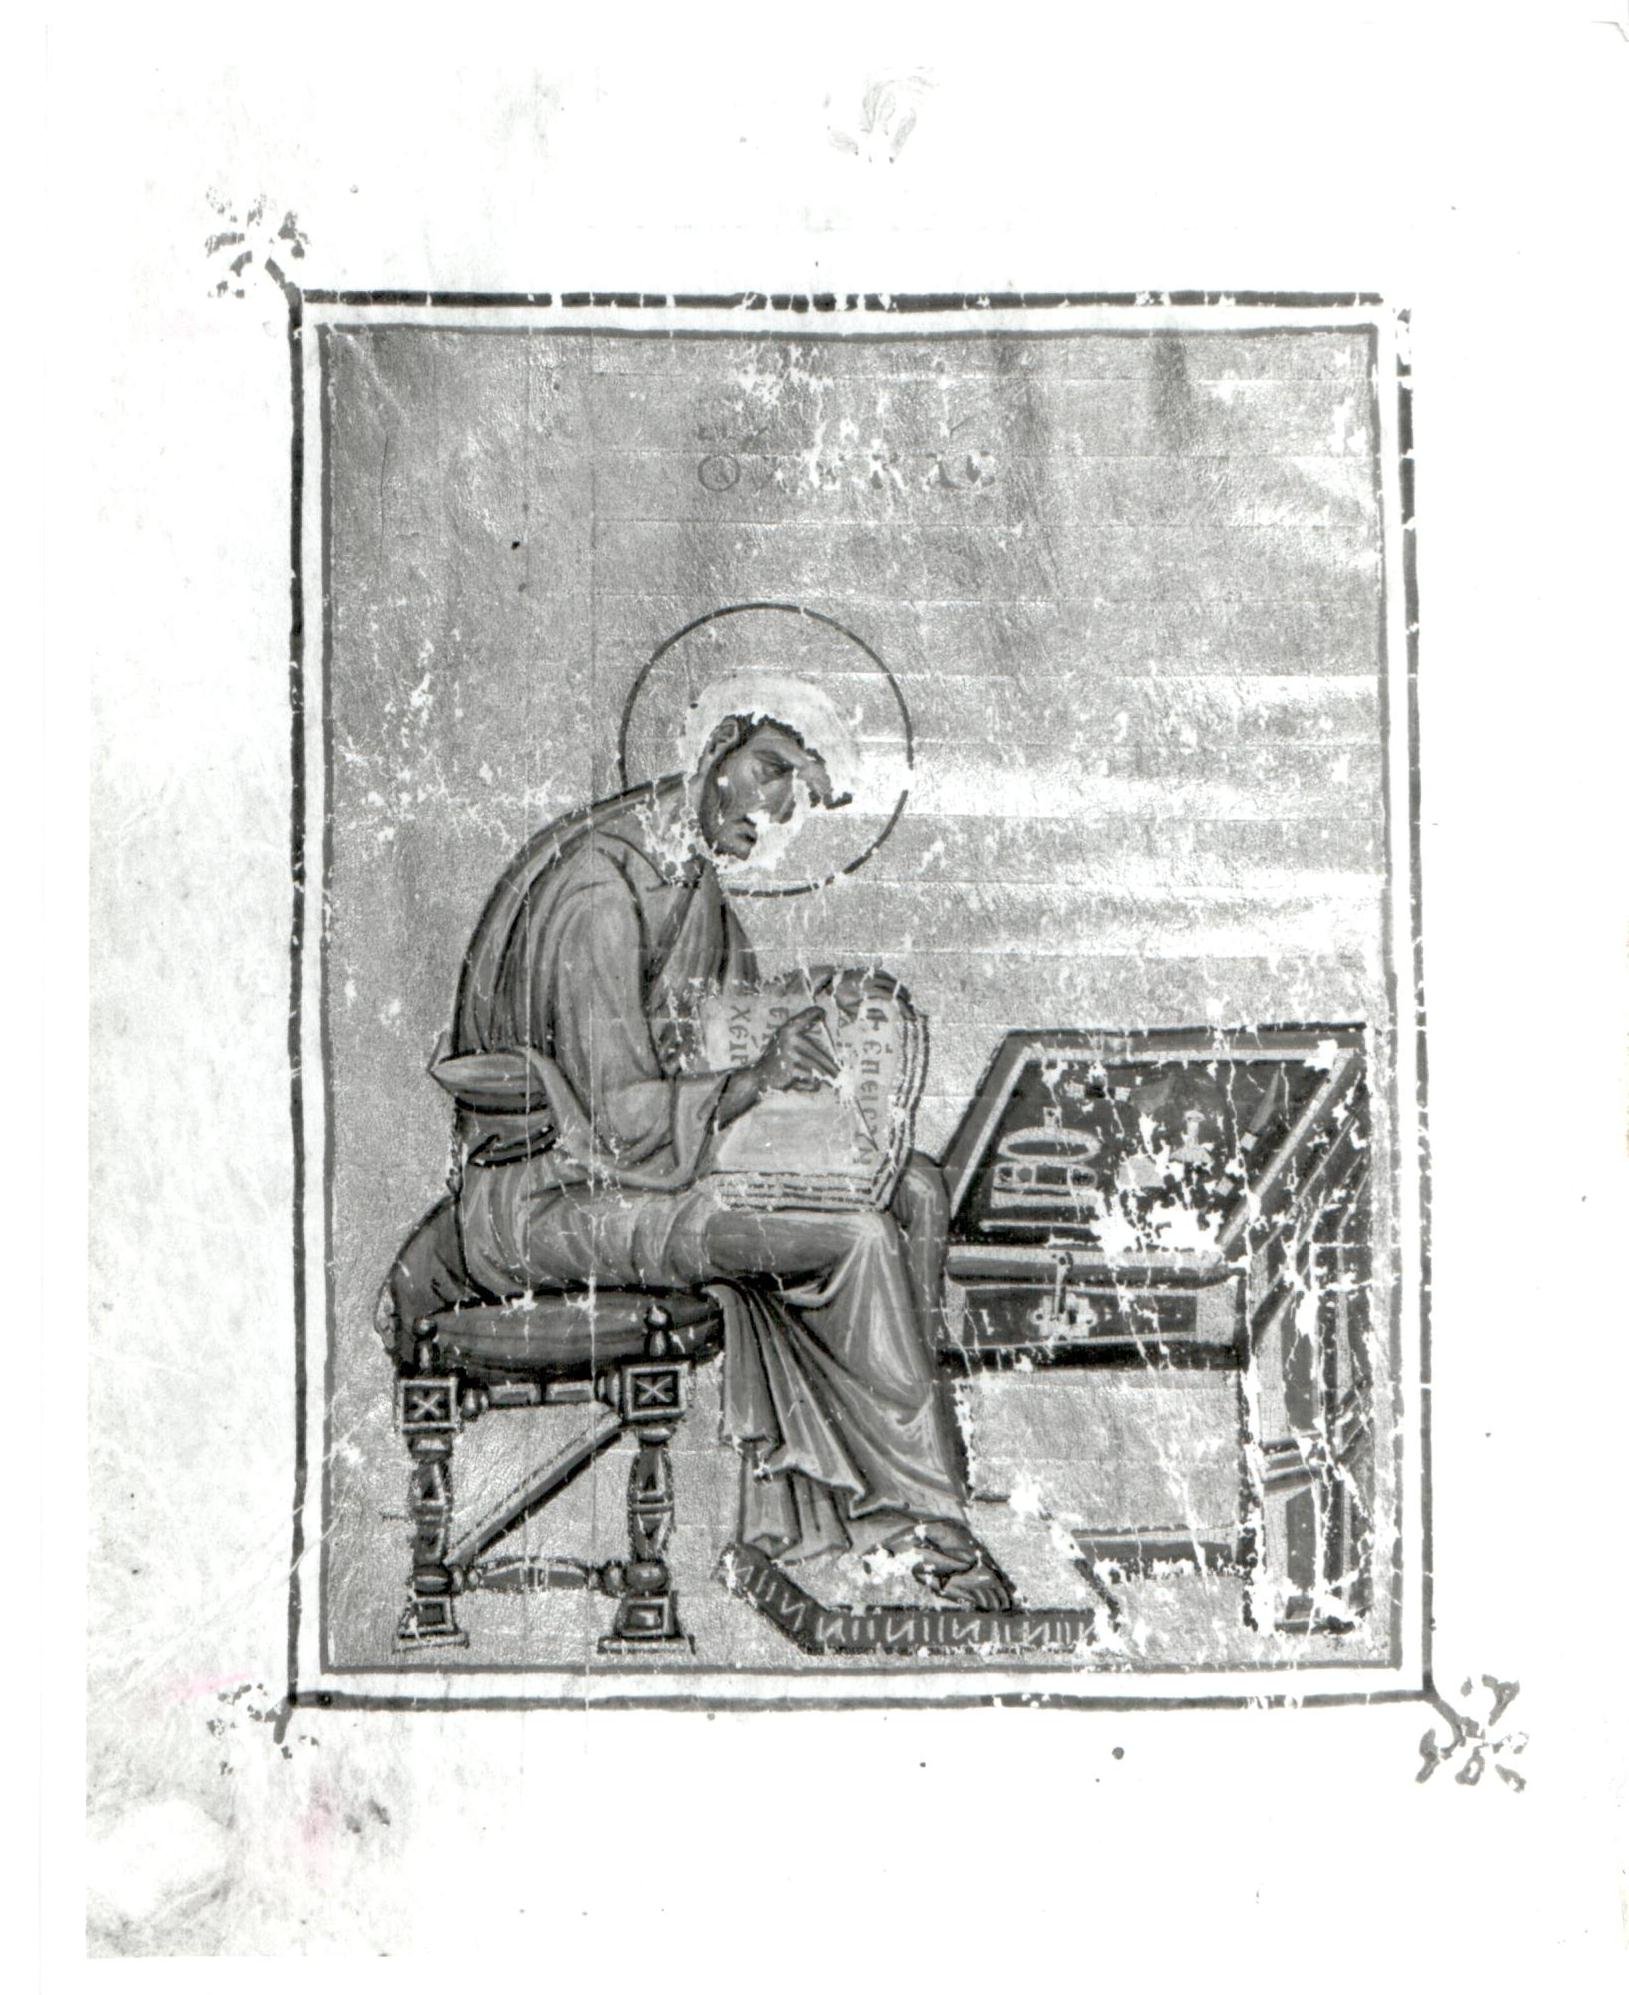 19. Beinecke MS 150, vol. 2, f. 3v